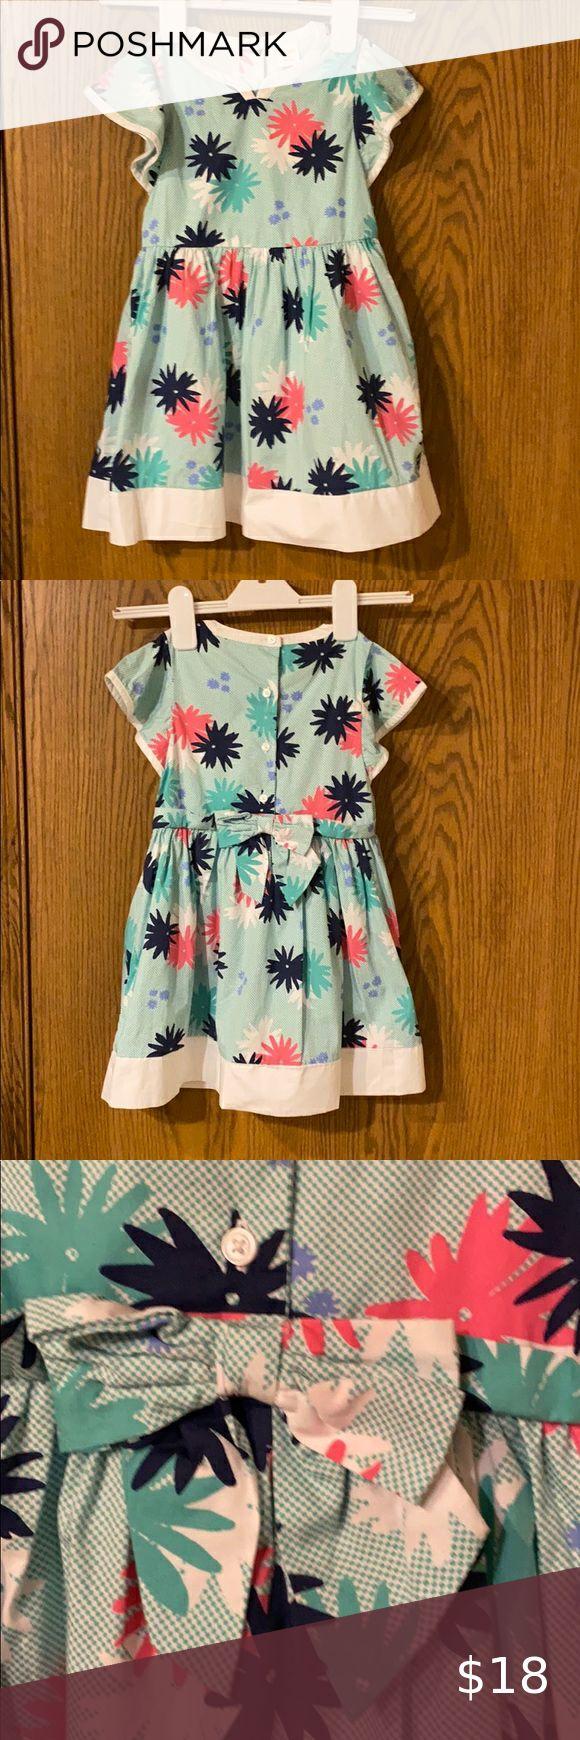 Gymboree Flower Print Dress Size 5t Girls Cotton Dresses Kids Dresses Cream Knitted Dress [ 1740 x 580 Pixel ]